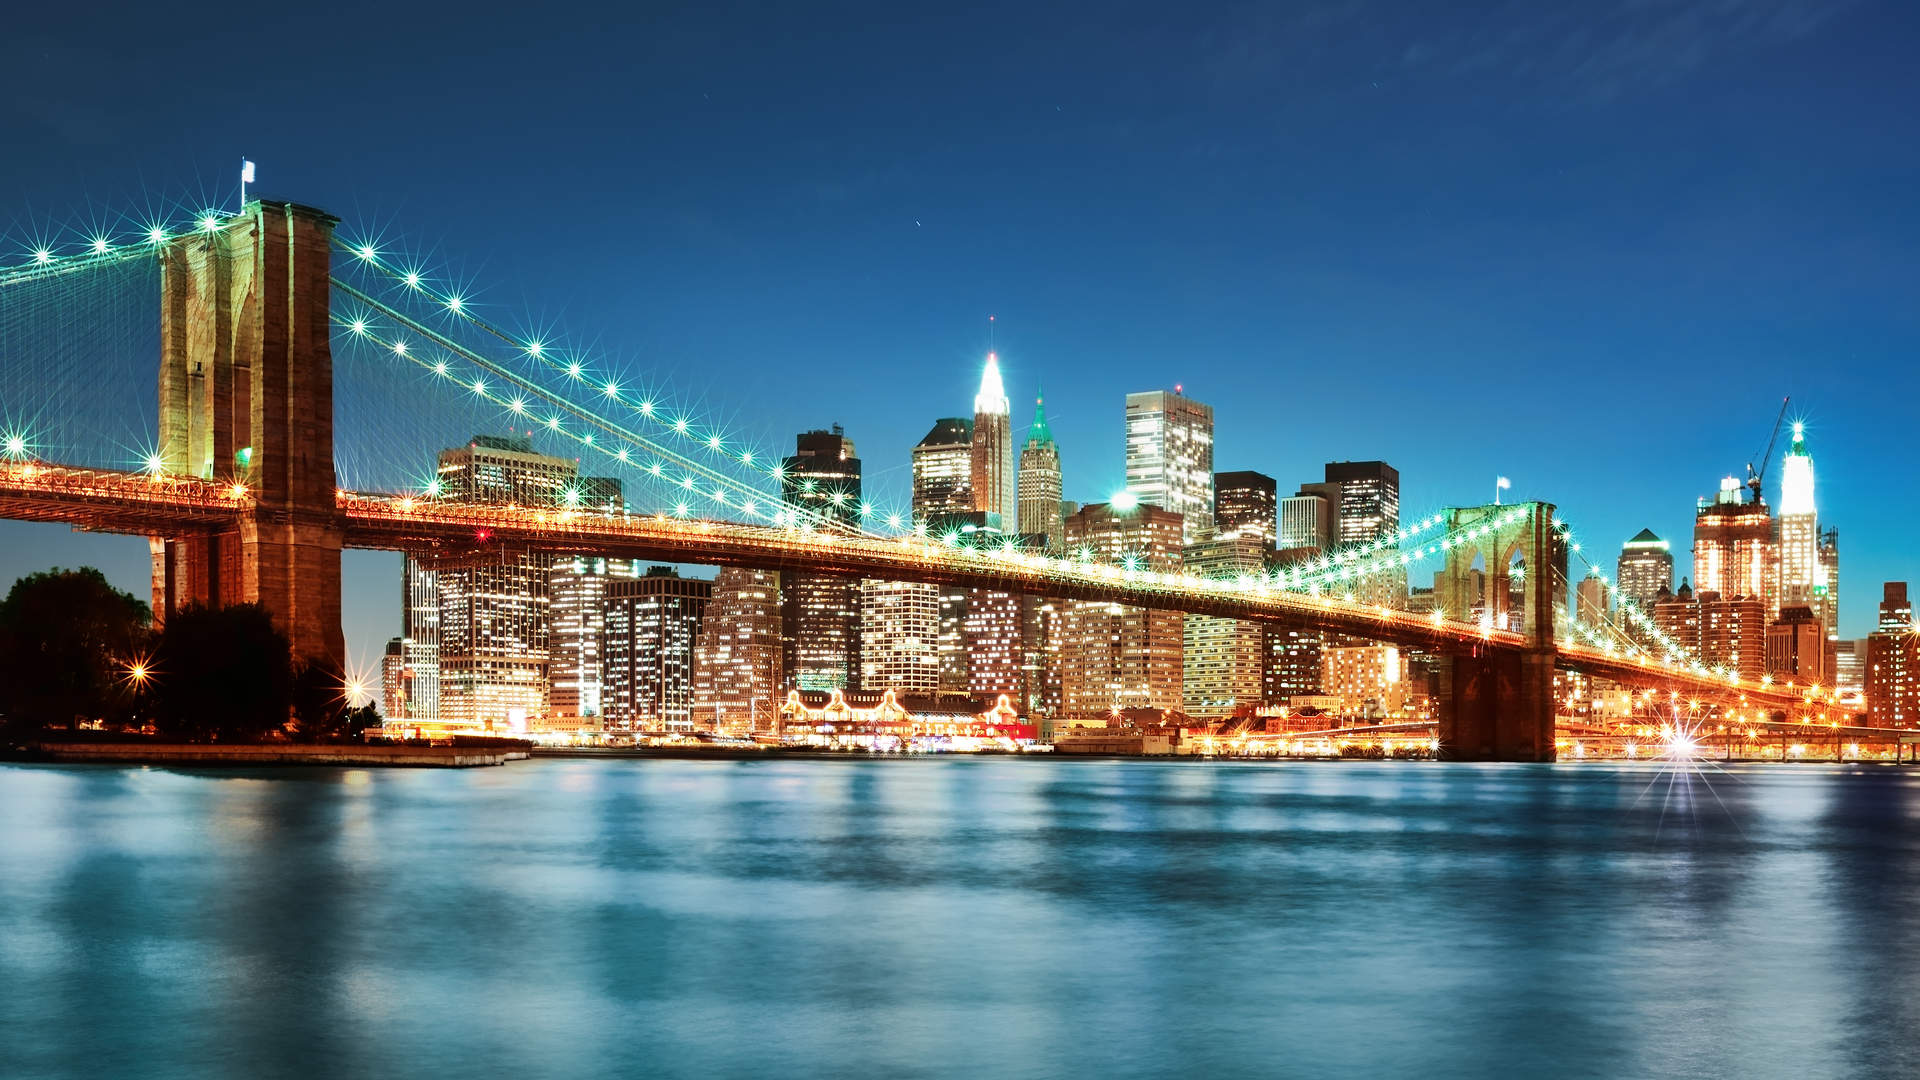 NewYork Wallpapers Brooklynbridge4